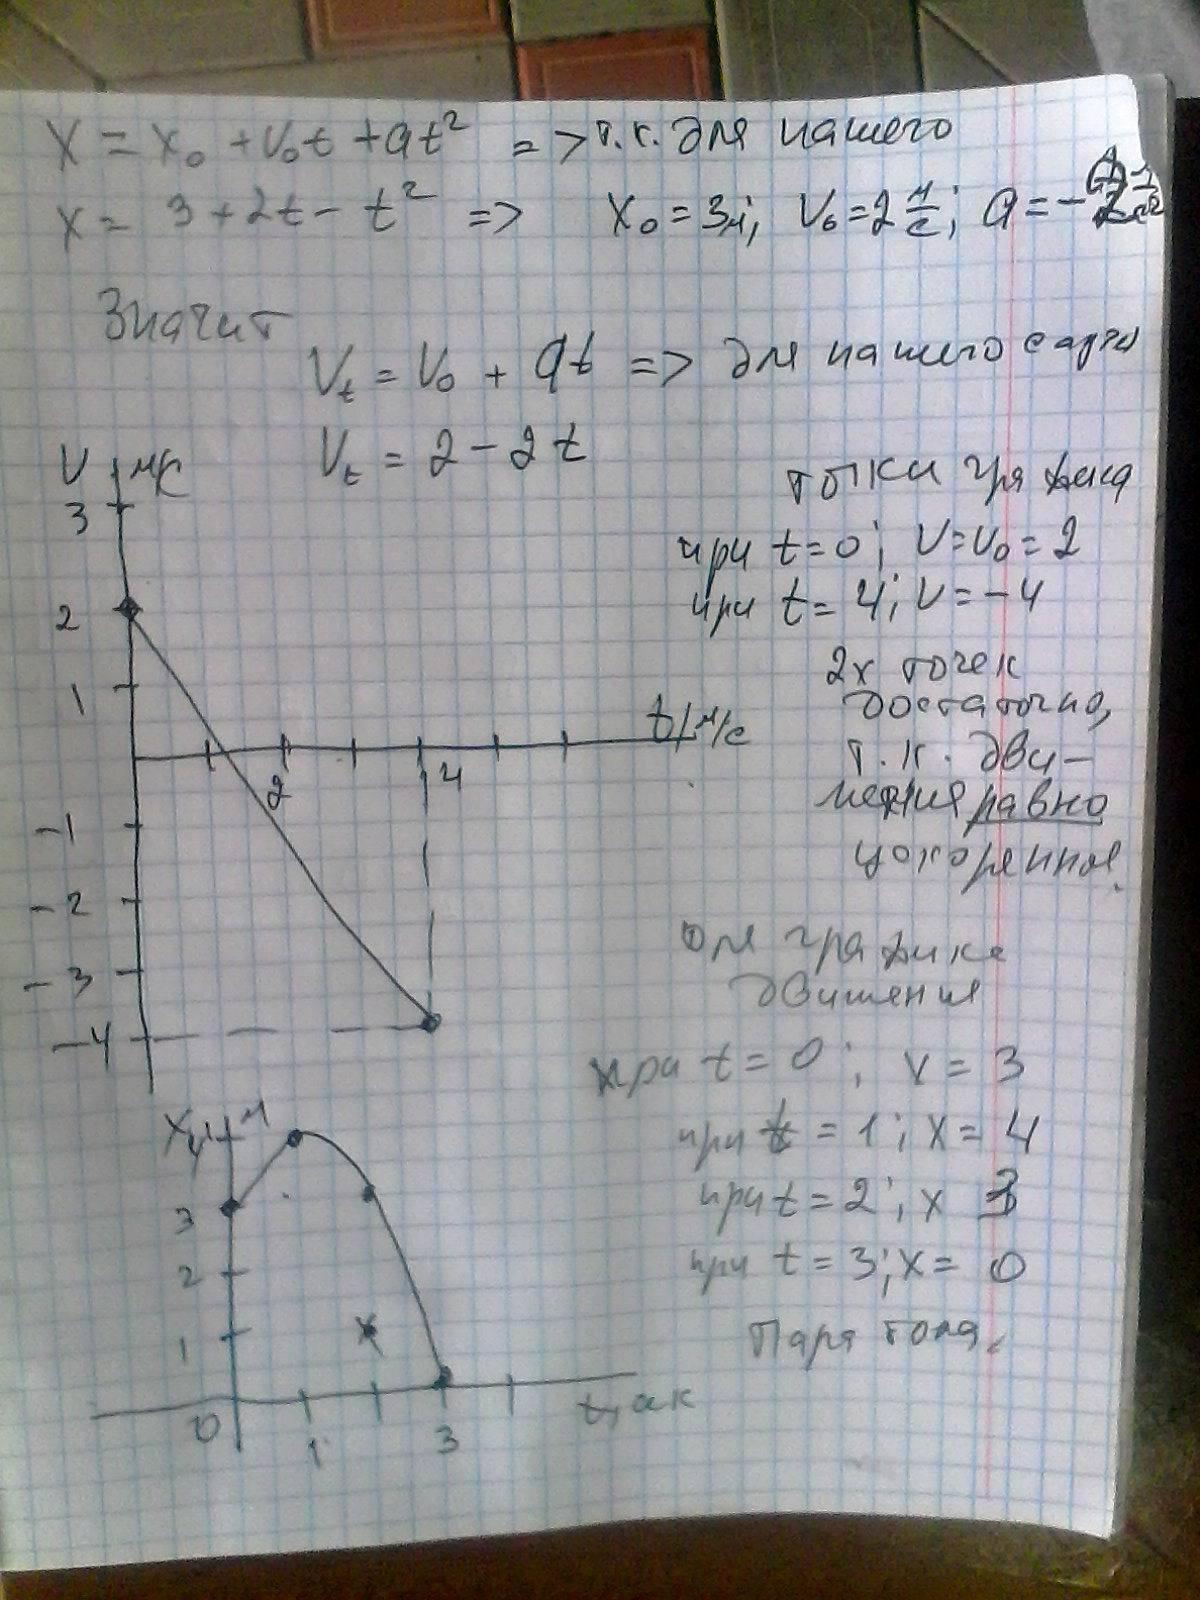 уравнение движения маятника имеет вид